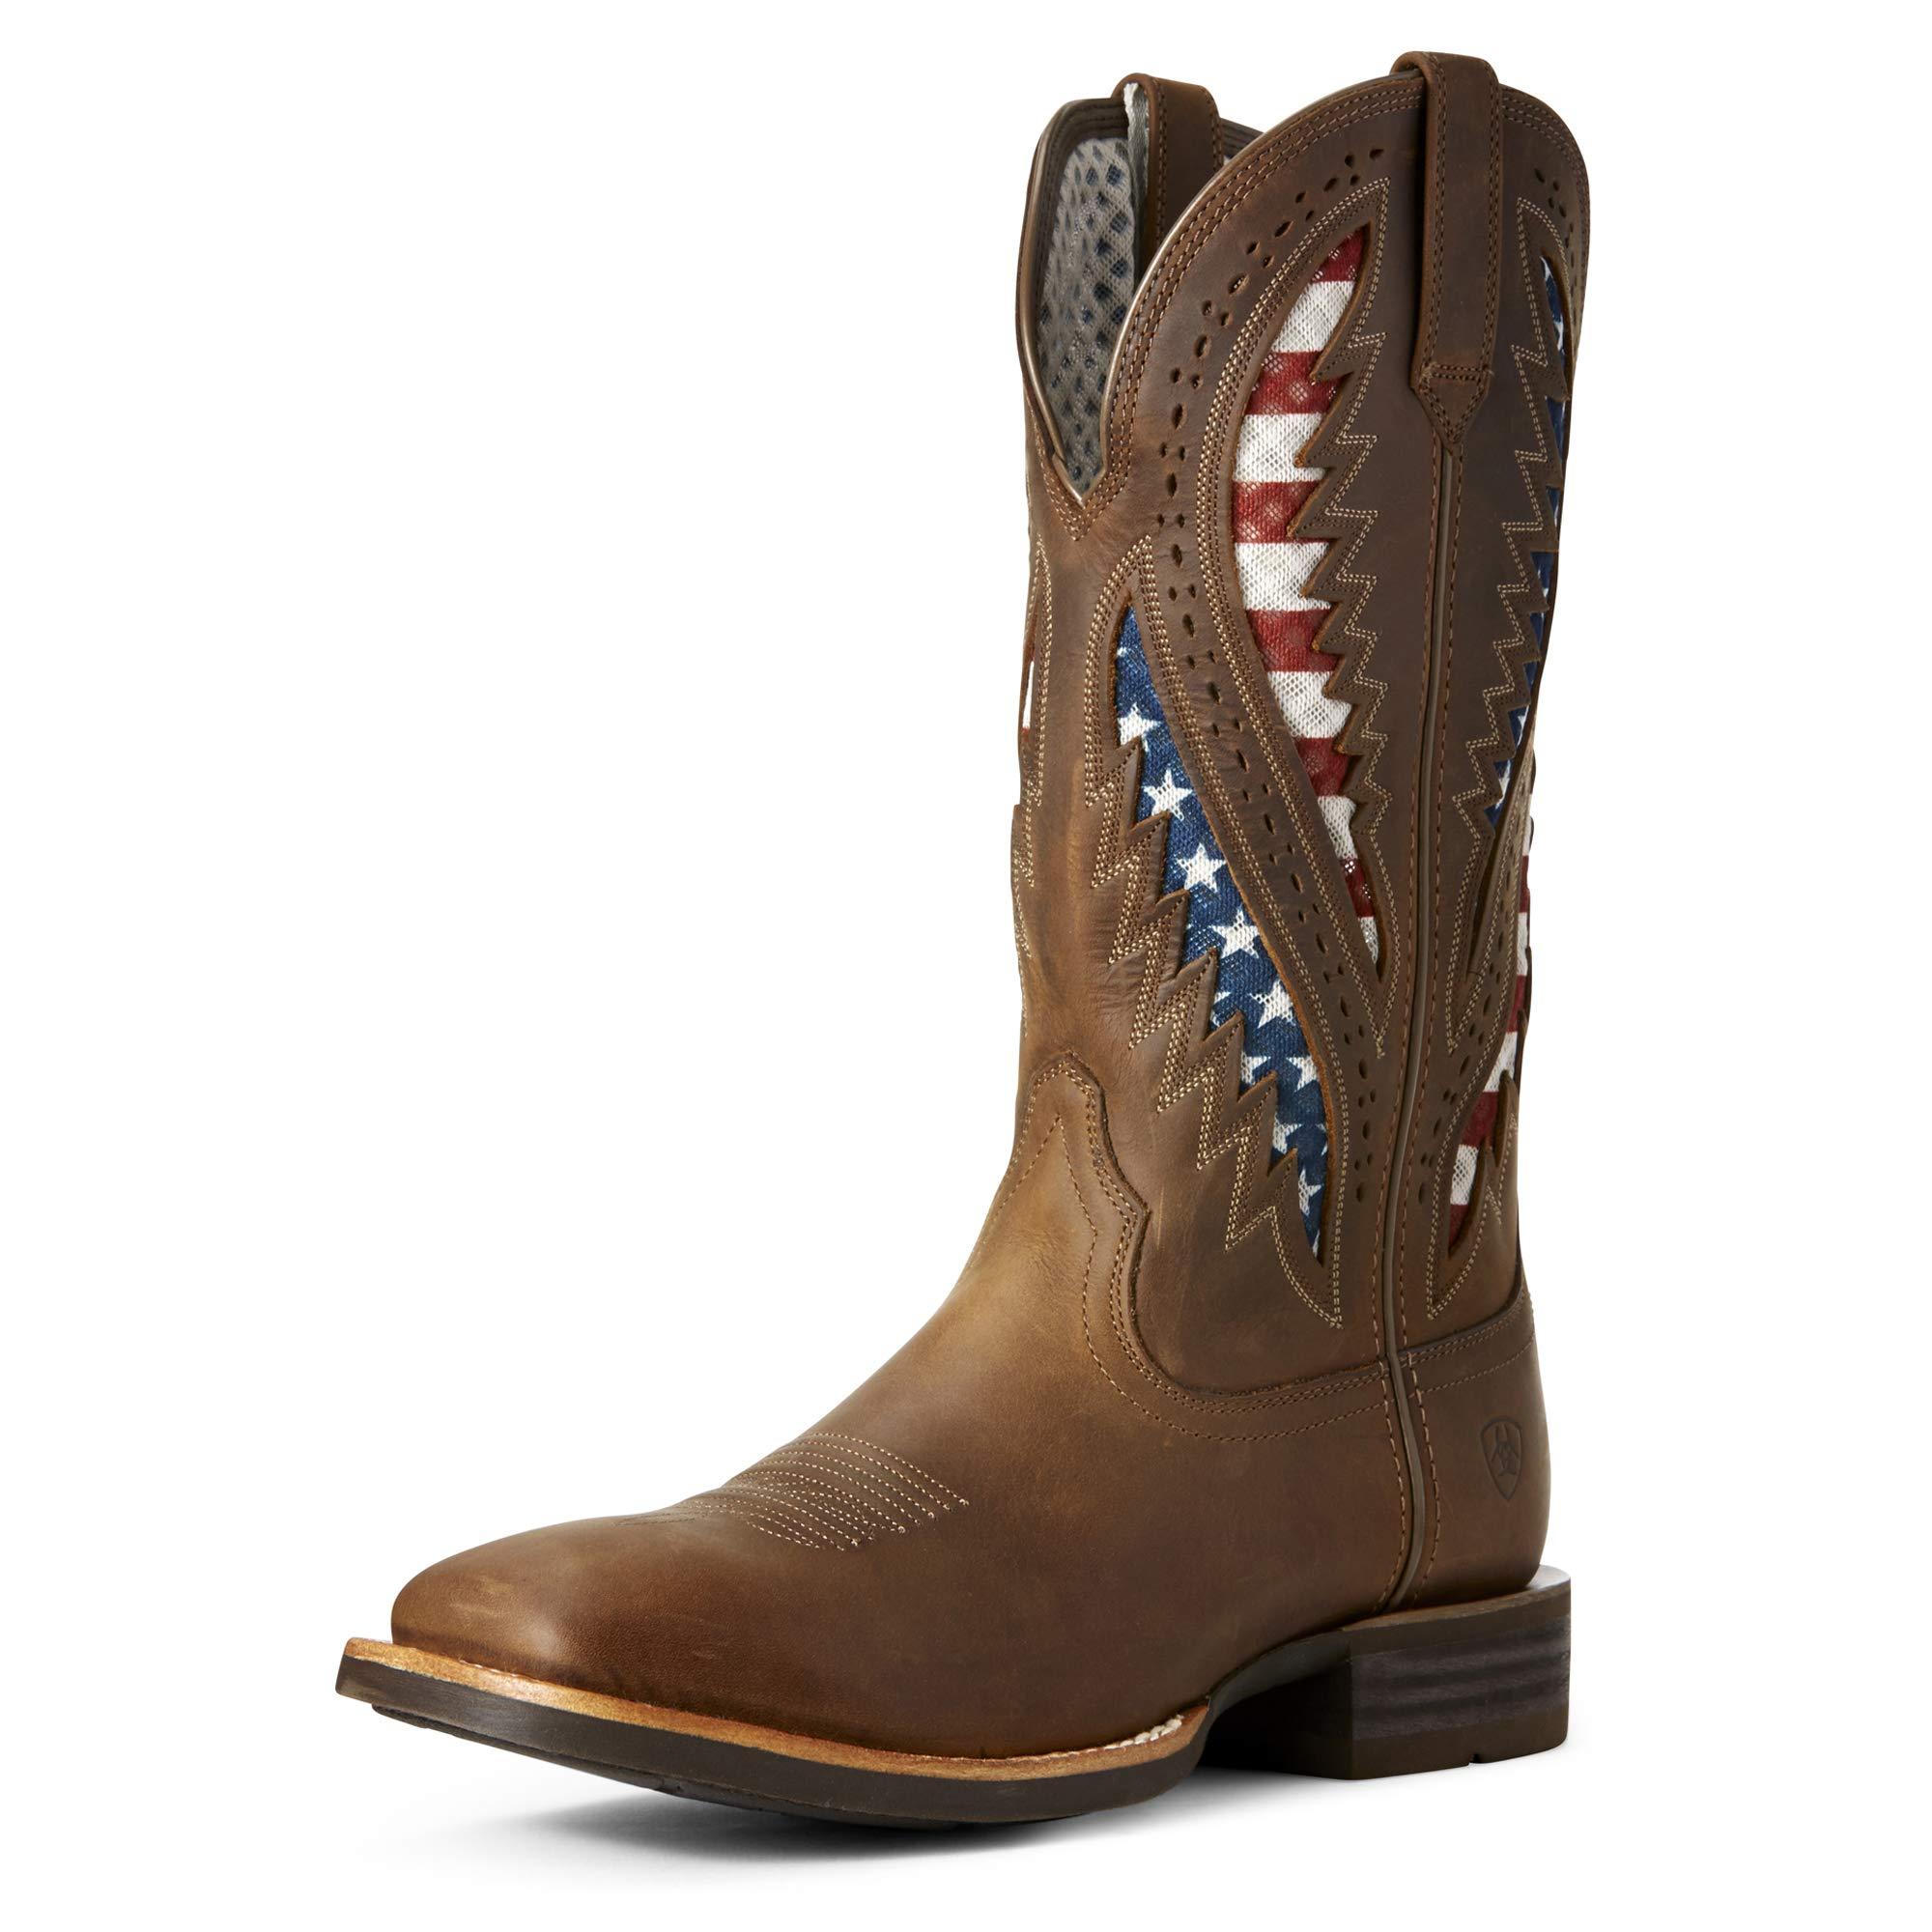 Ariat Men's Quickdraw Venttek Western Boot, Distressed Brown, 9.5D by ARIAT